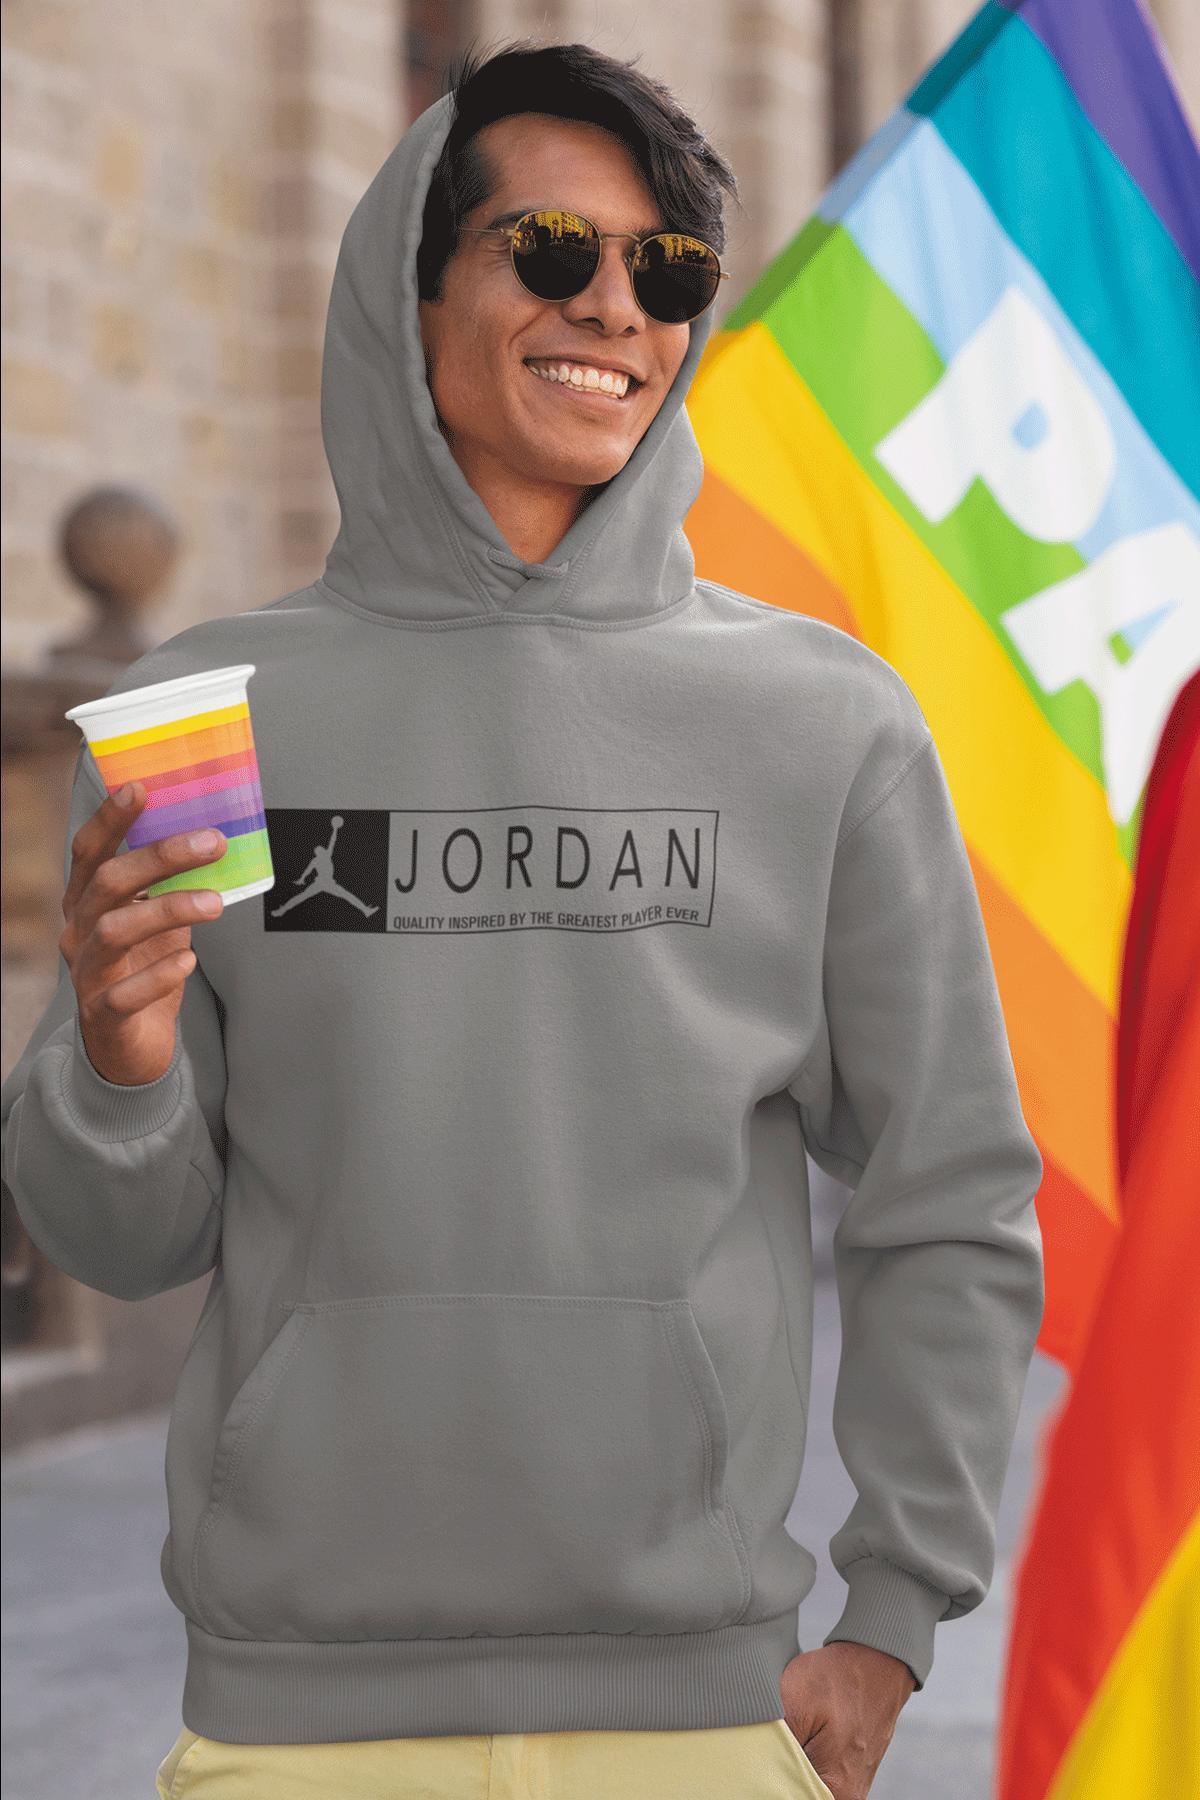 Air Jordan 13 Gri NBA Erkek Kapşonlu Sweatshirt - Hoodie